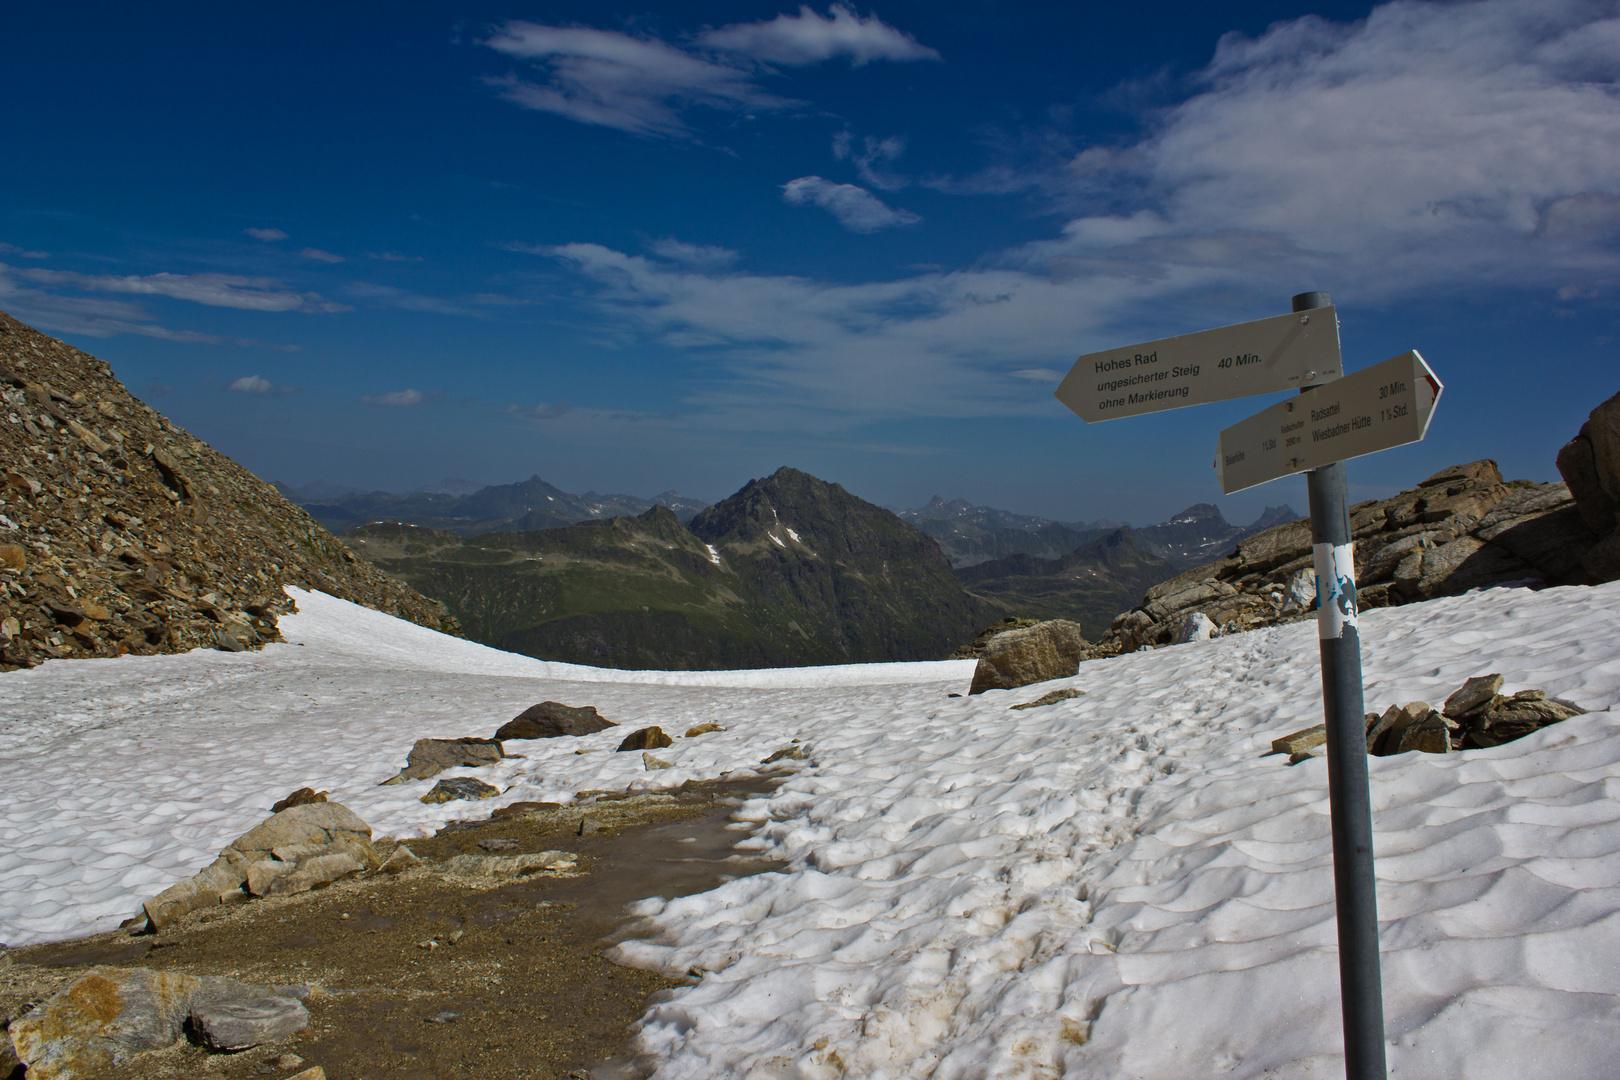 Radschulter 2690m